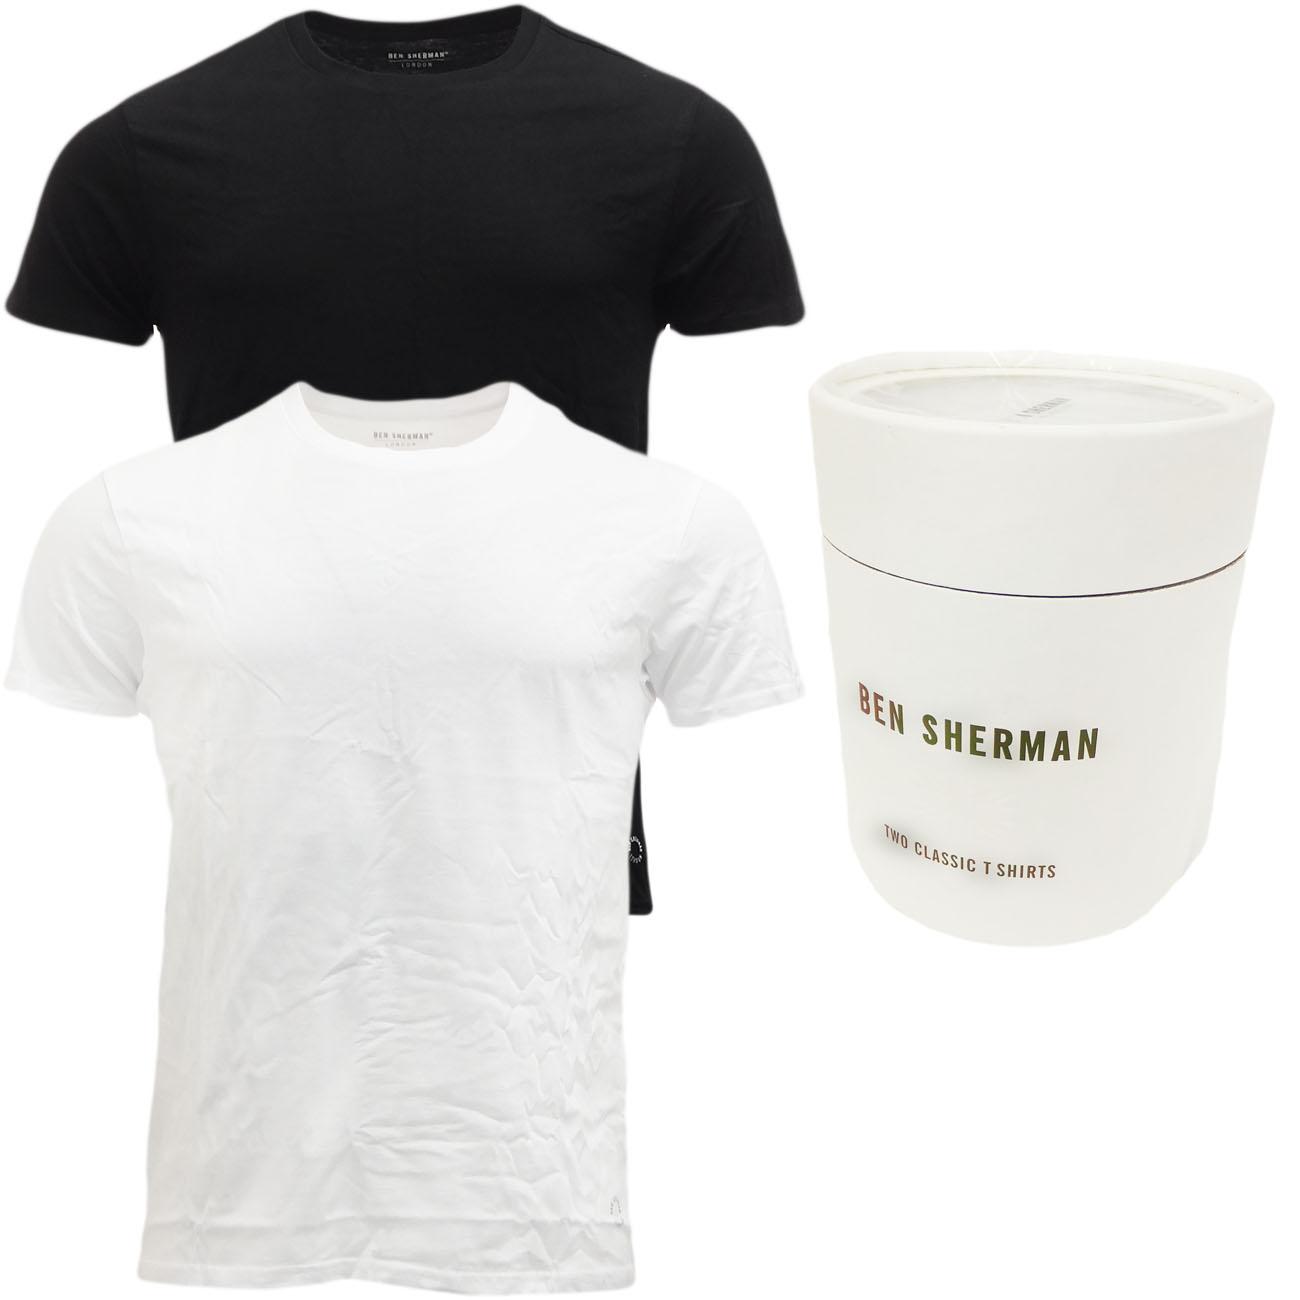 Plain black t shirt xxl - Mens Ben Sherman T Shirt Gift Box Pack Of 2 Plain T Shirts New S M L